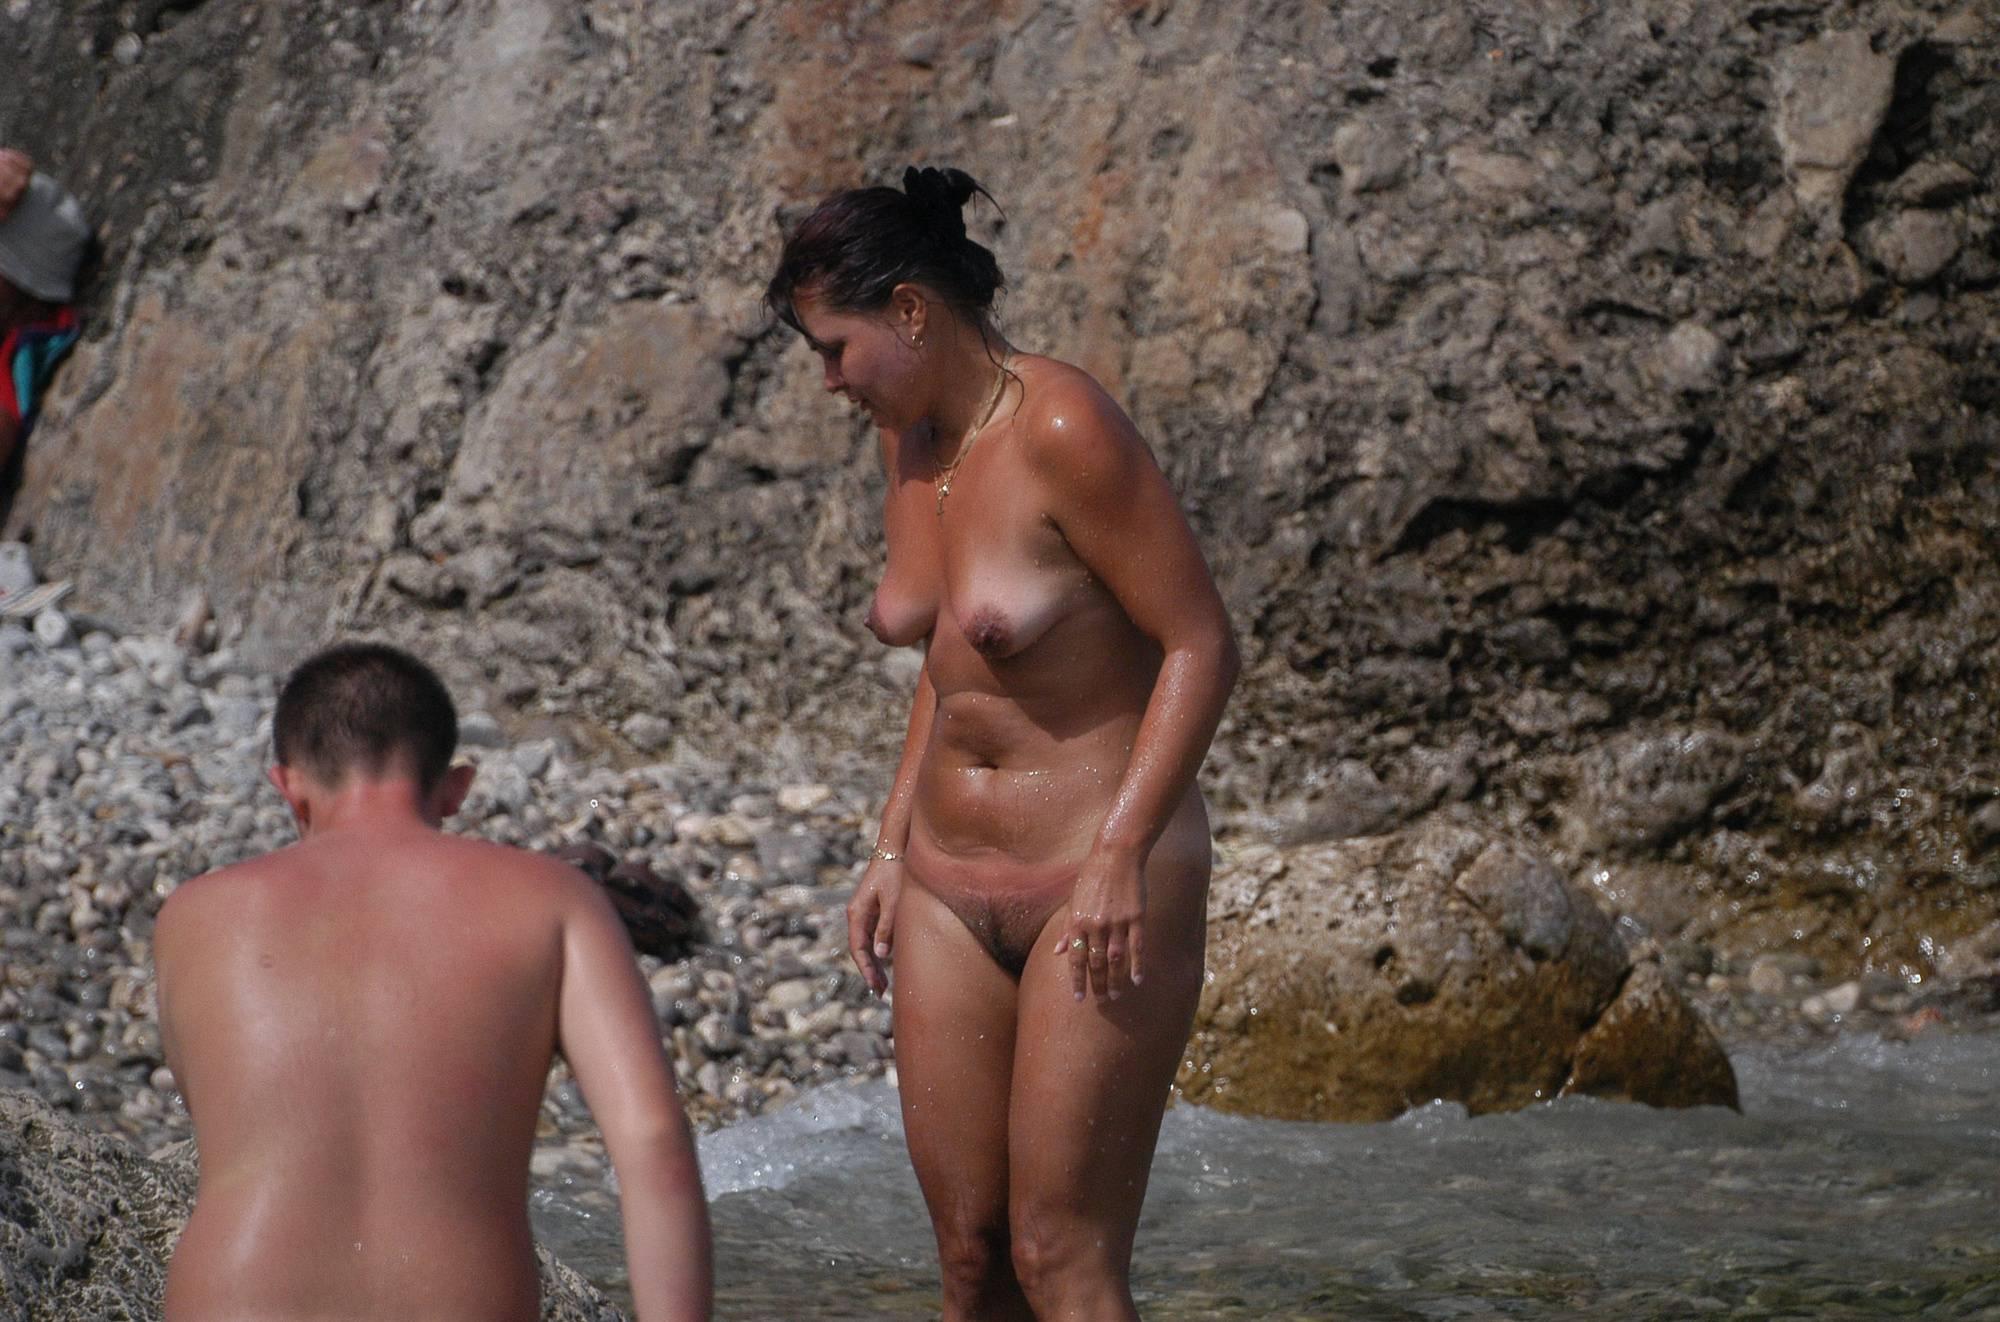 Pure Nudism Photos-Croatian KRK Shore Shots - 3